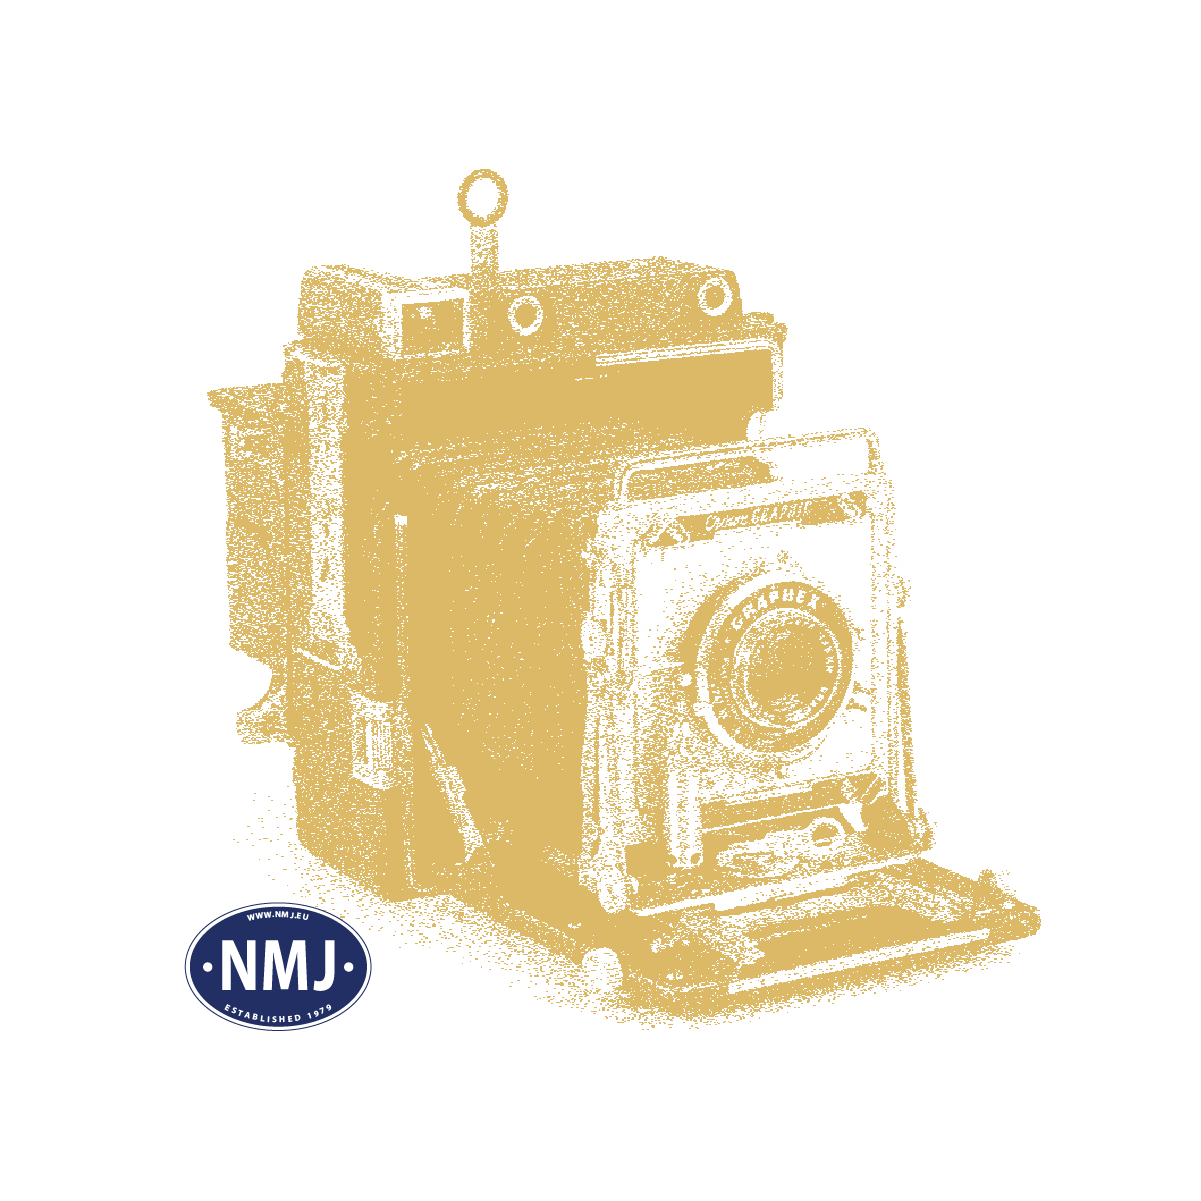 NMJT90014 - NMJ Topline NSB Di3a 620, Gammeldesign, DCC m/ Lyd